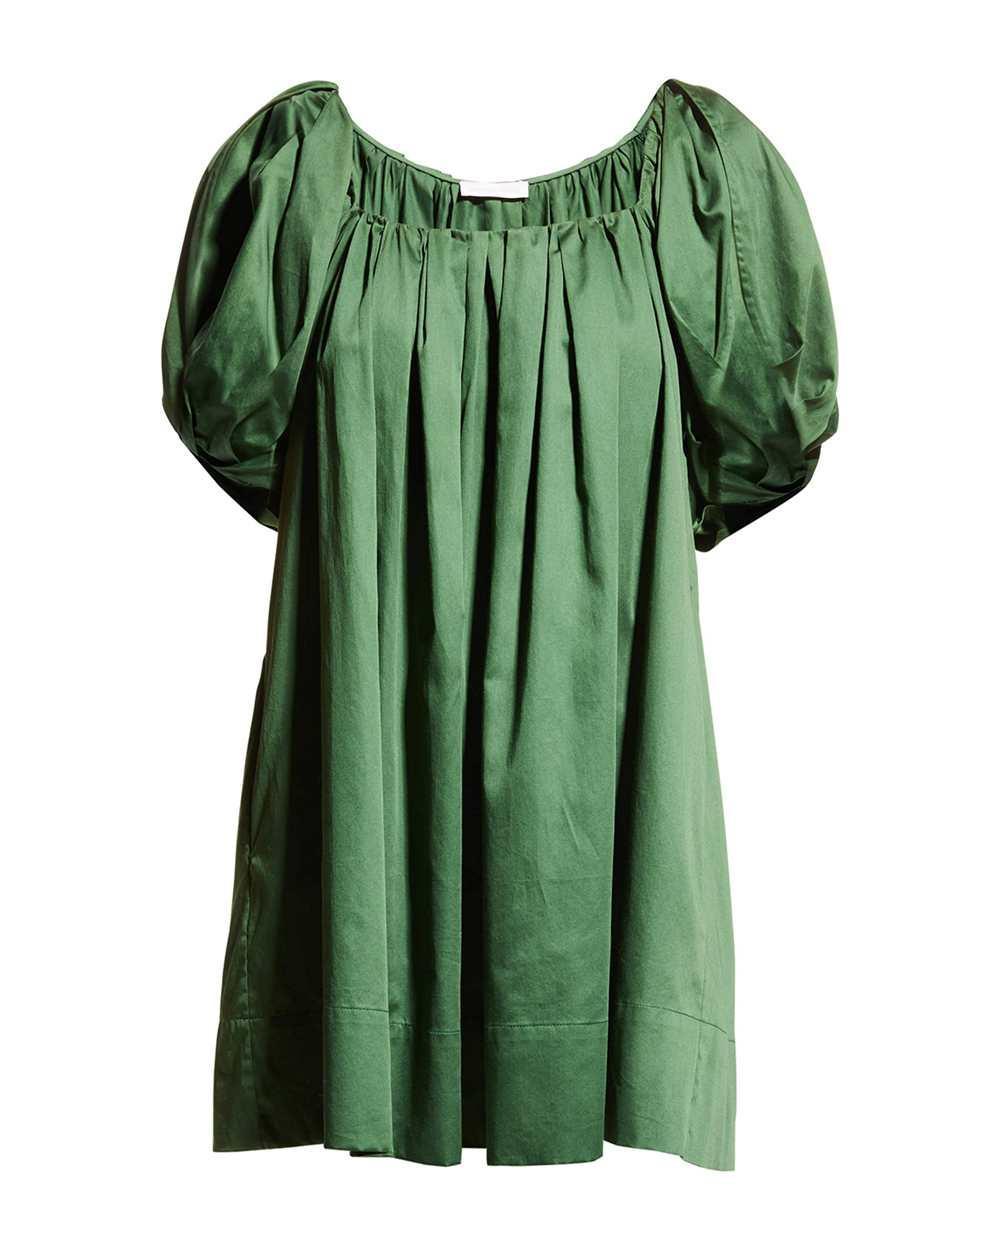 Baby Doll Dress Item # 721158D953